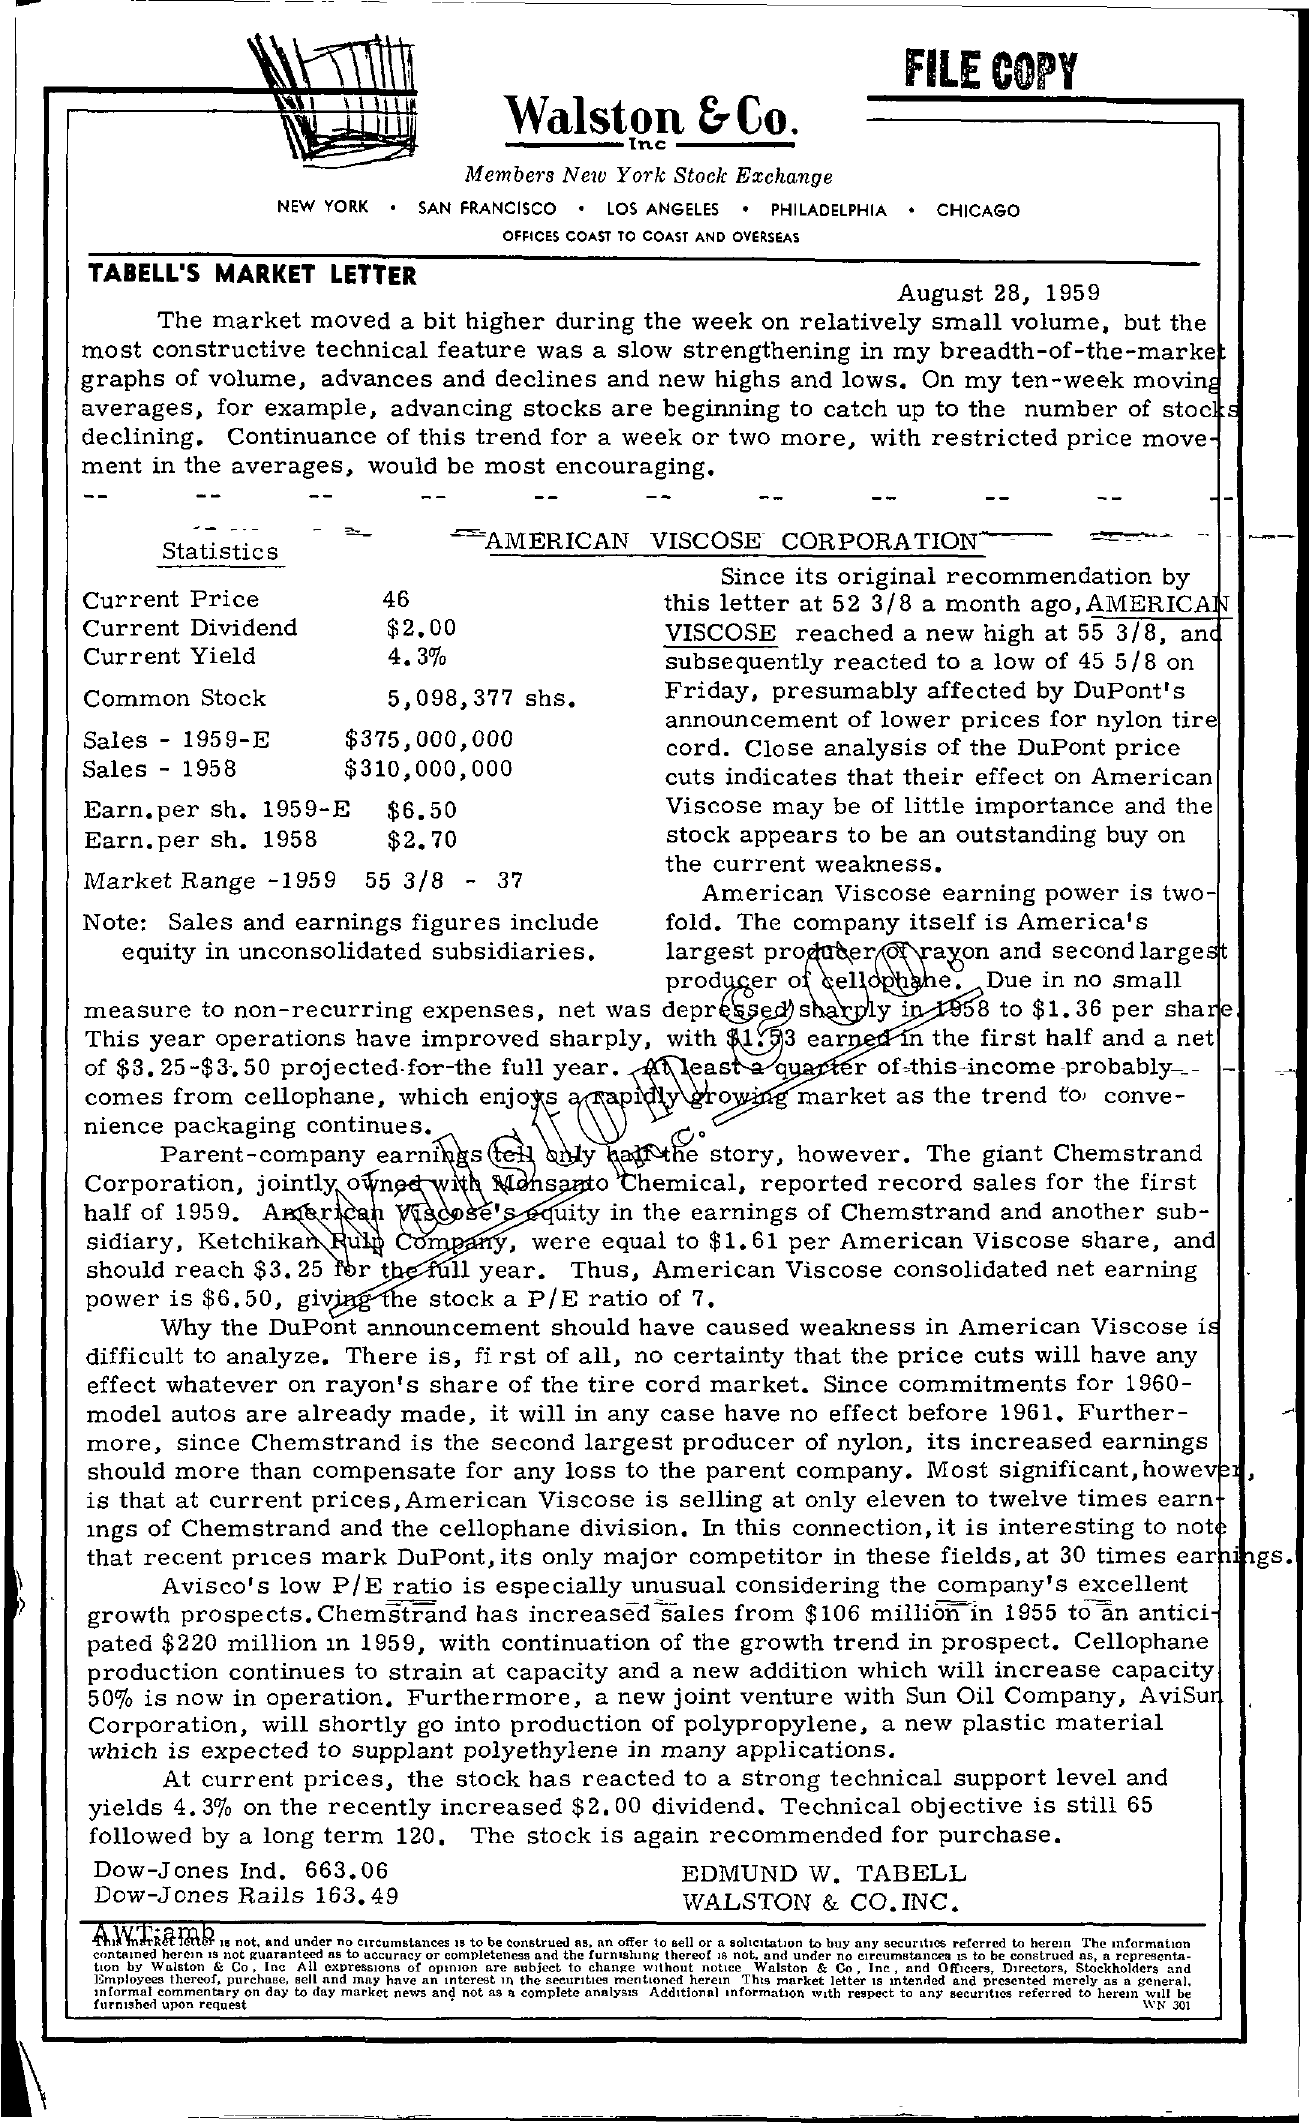 Tabell's Market Letter - August 28, 1959